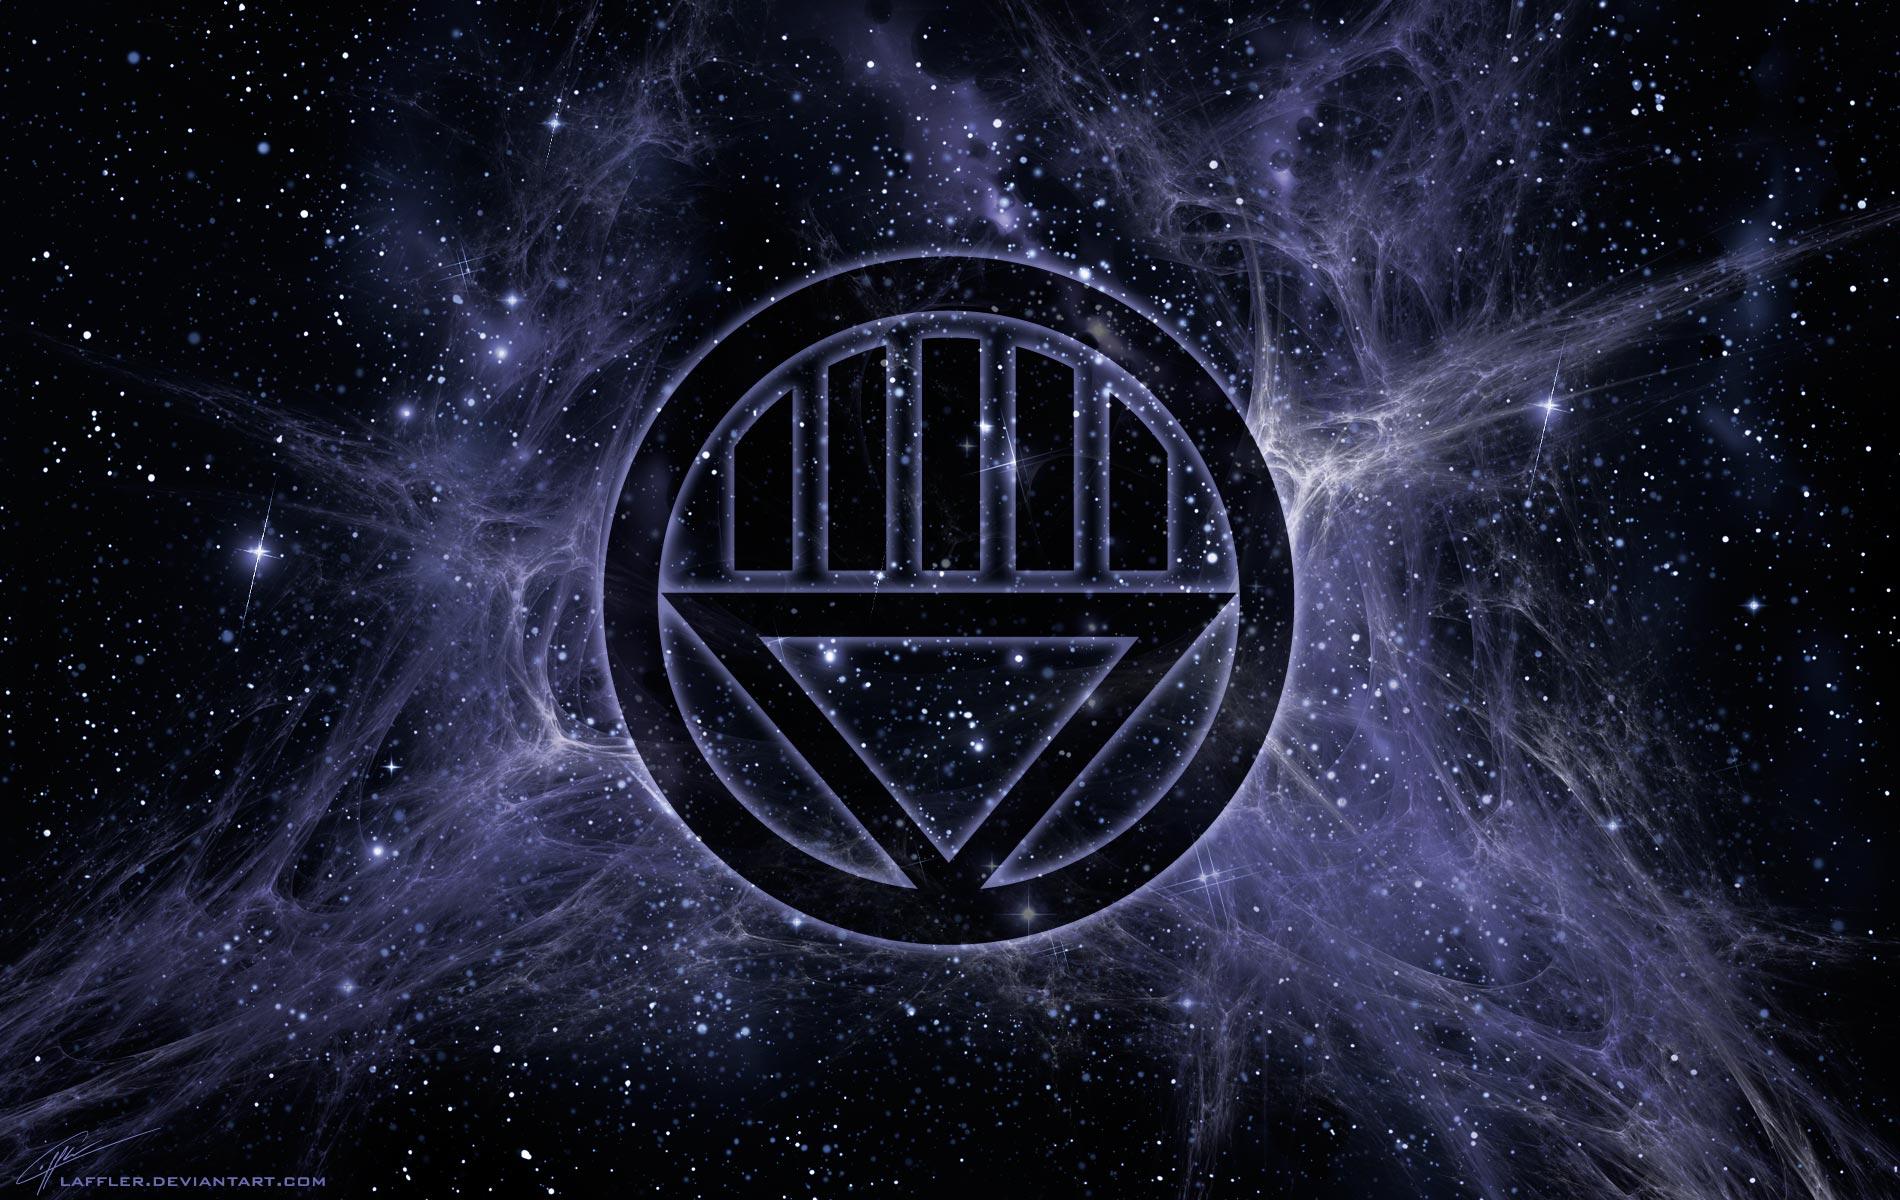 Blue Lantern Corps Symbol